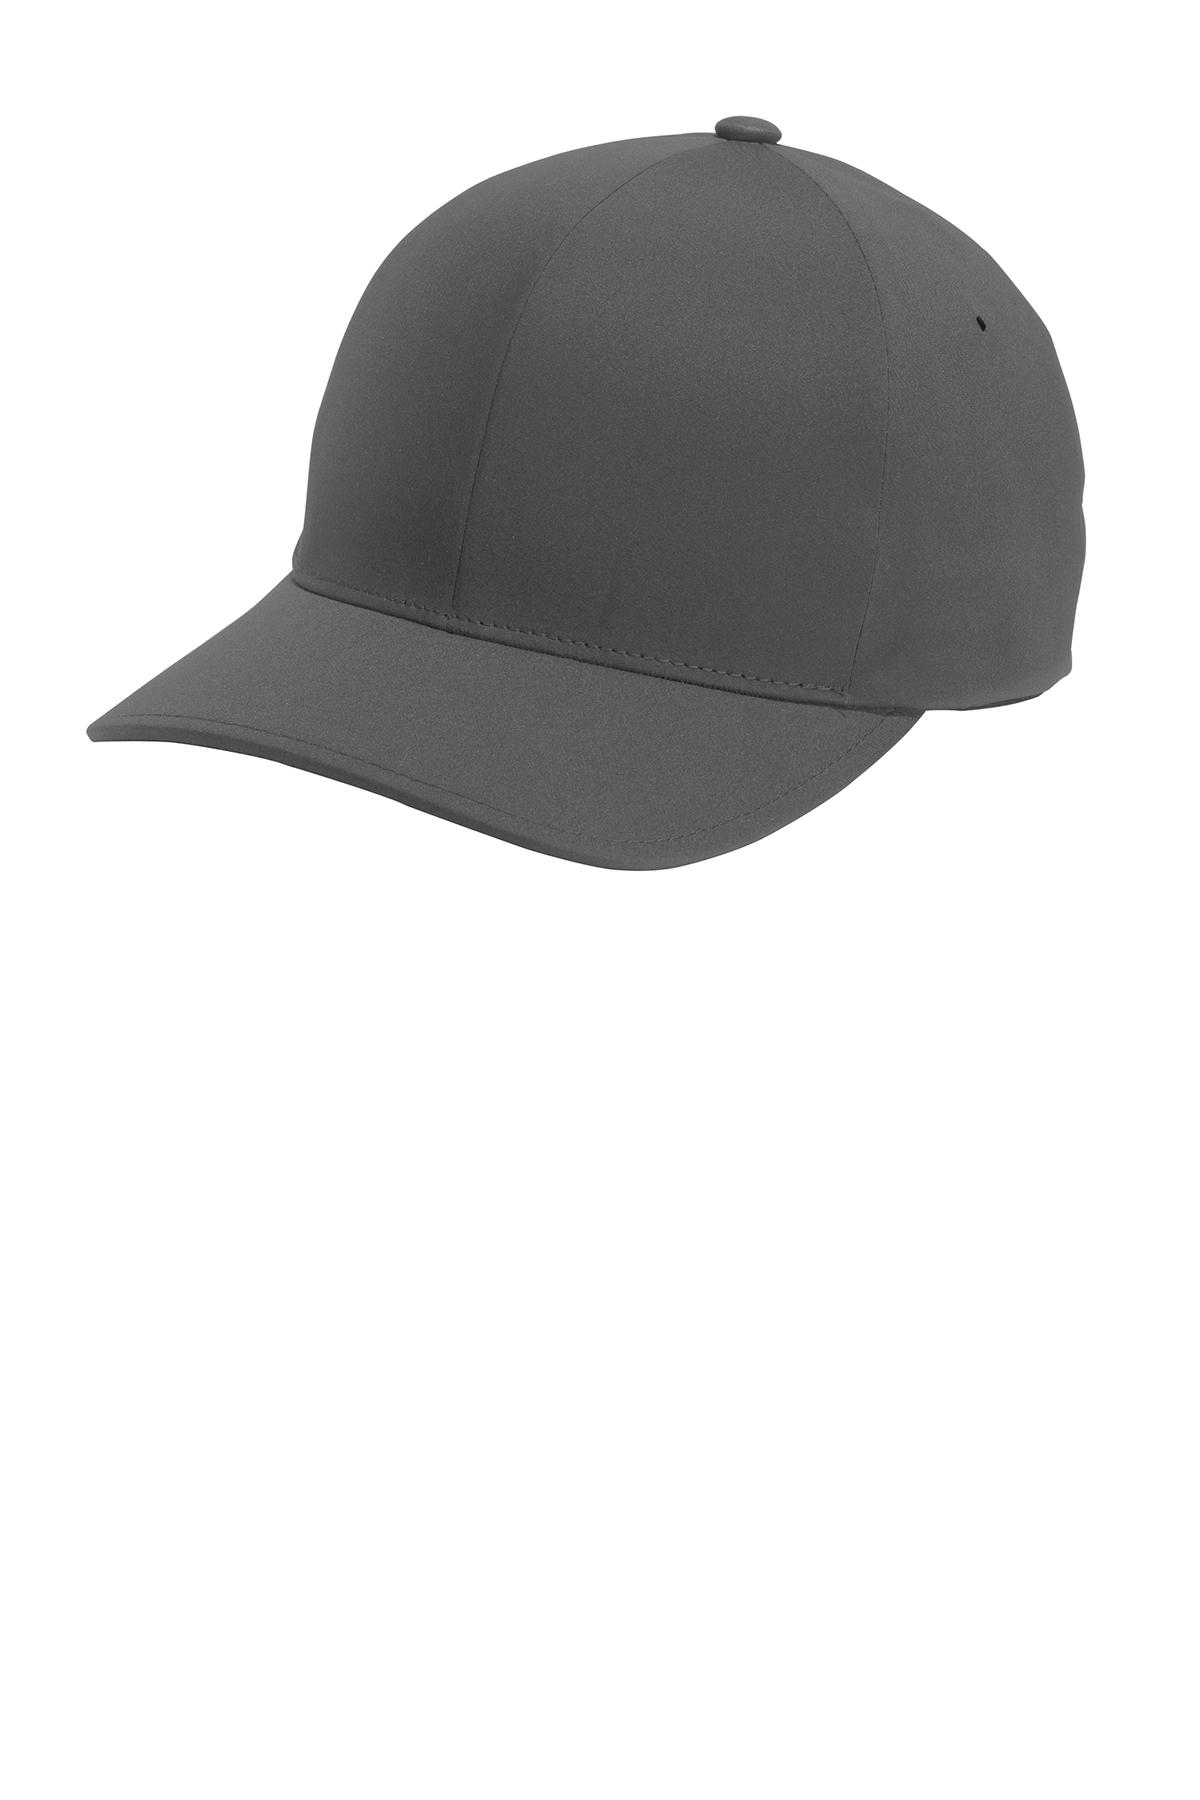 Port Authority ® Flexfit ® Delta ® Cap. Brand Logo 7124209be269